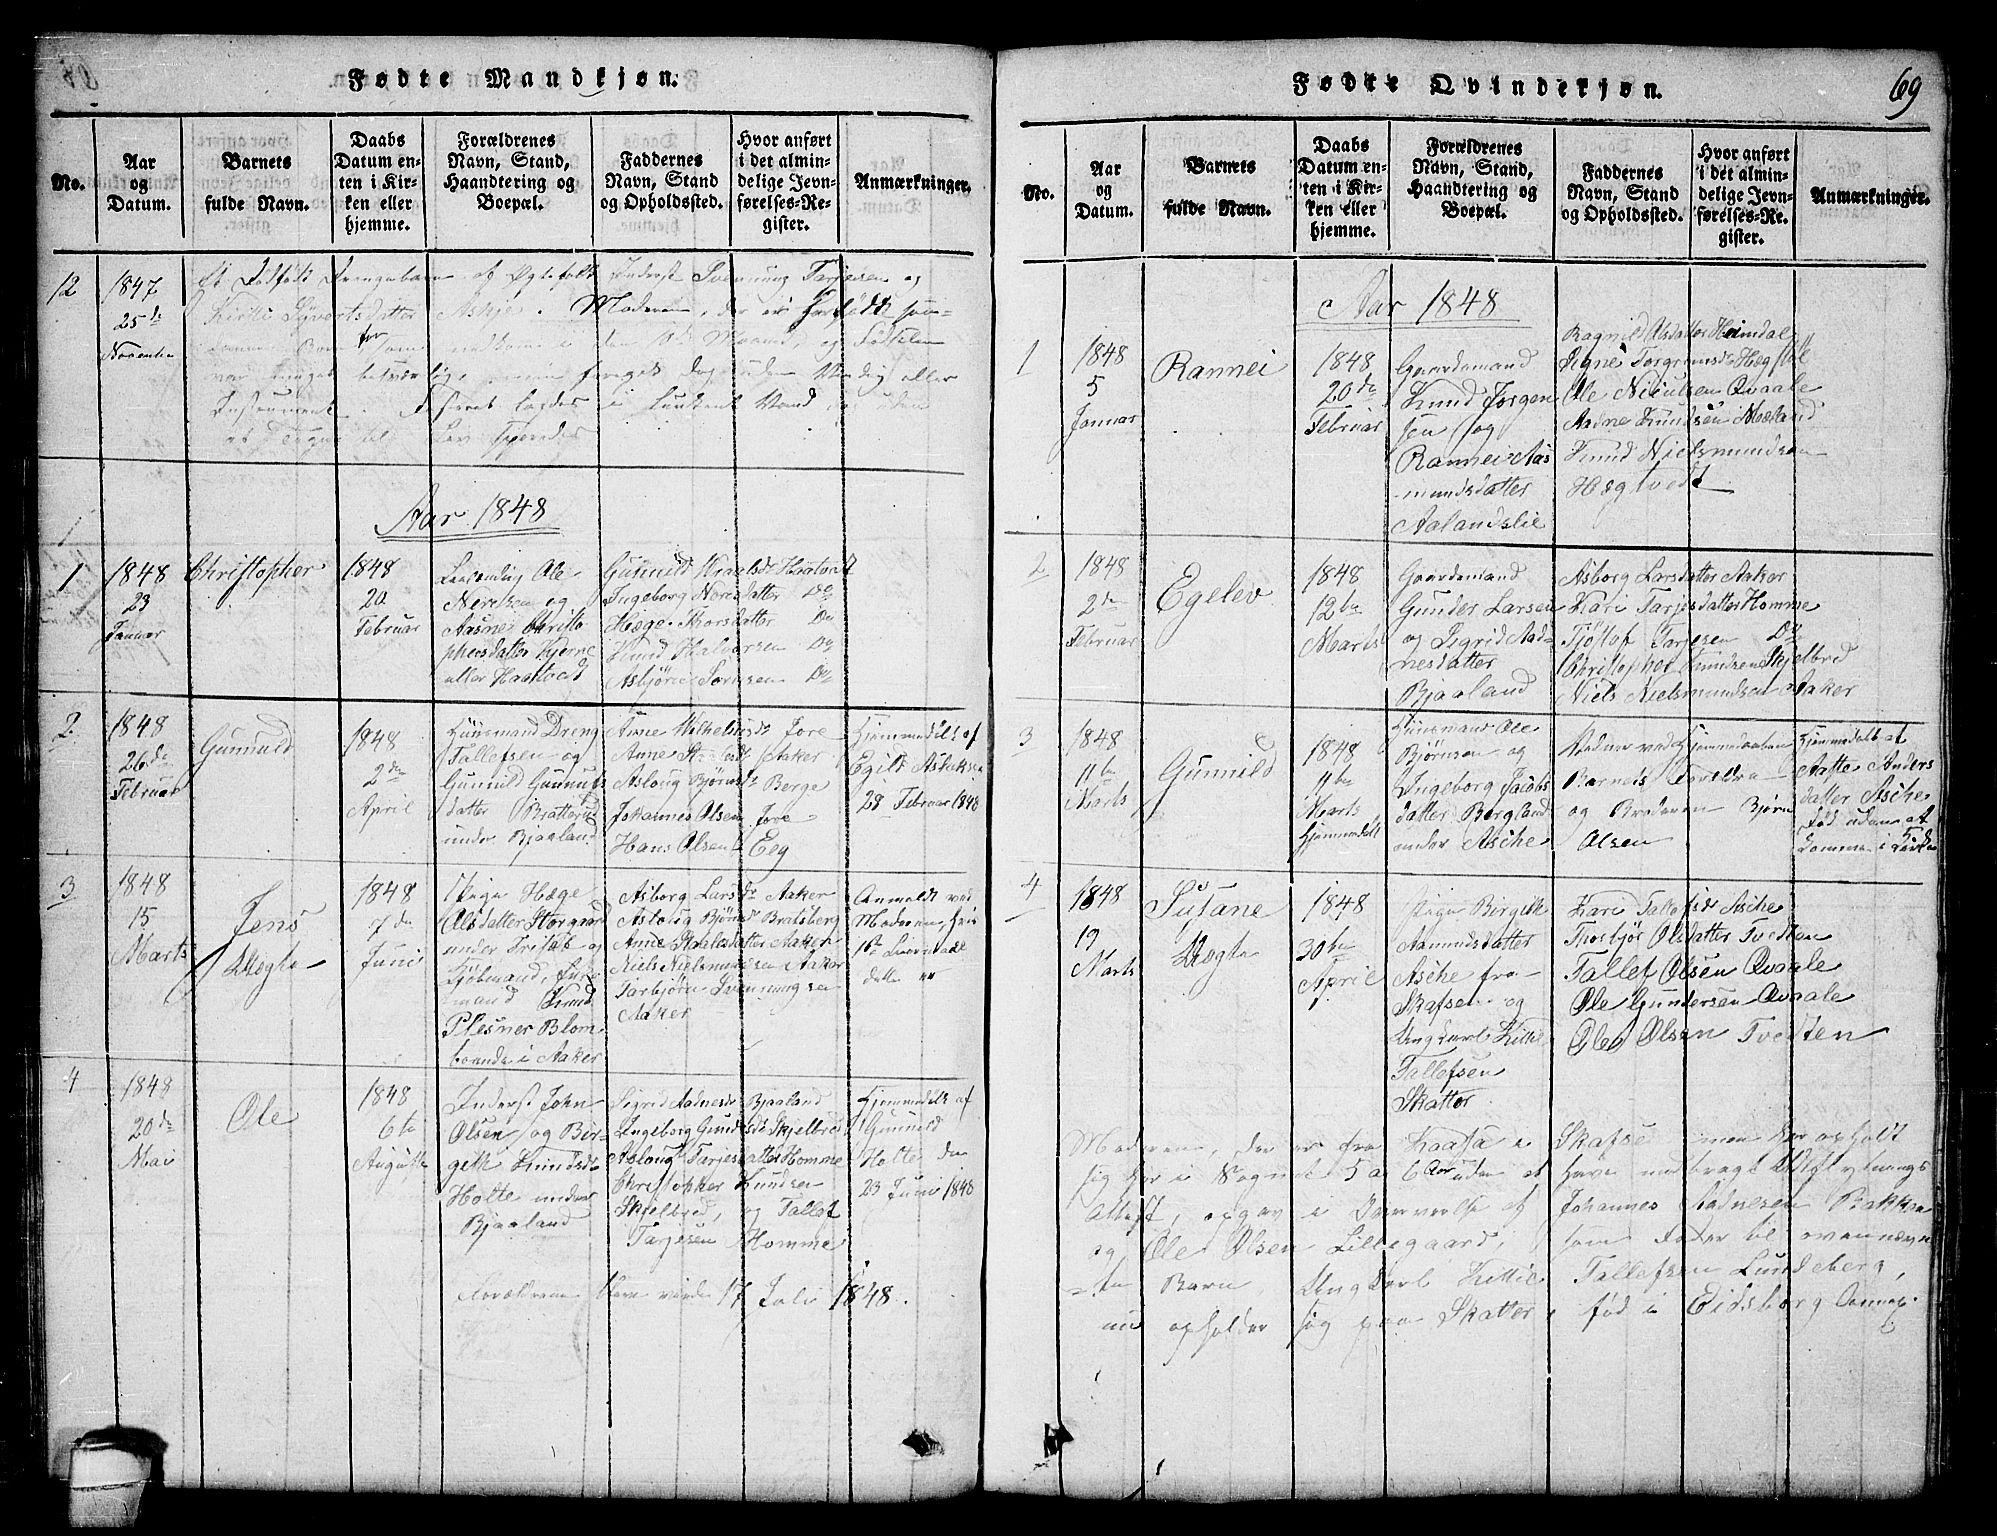 SAKO, Lårdal kirkebøker, G/Ga/L0001: Klokkerbok nr. I 1, 1815-1861, s. 69